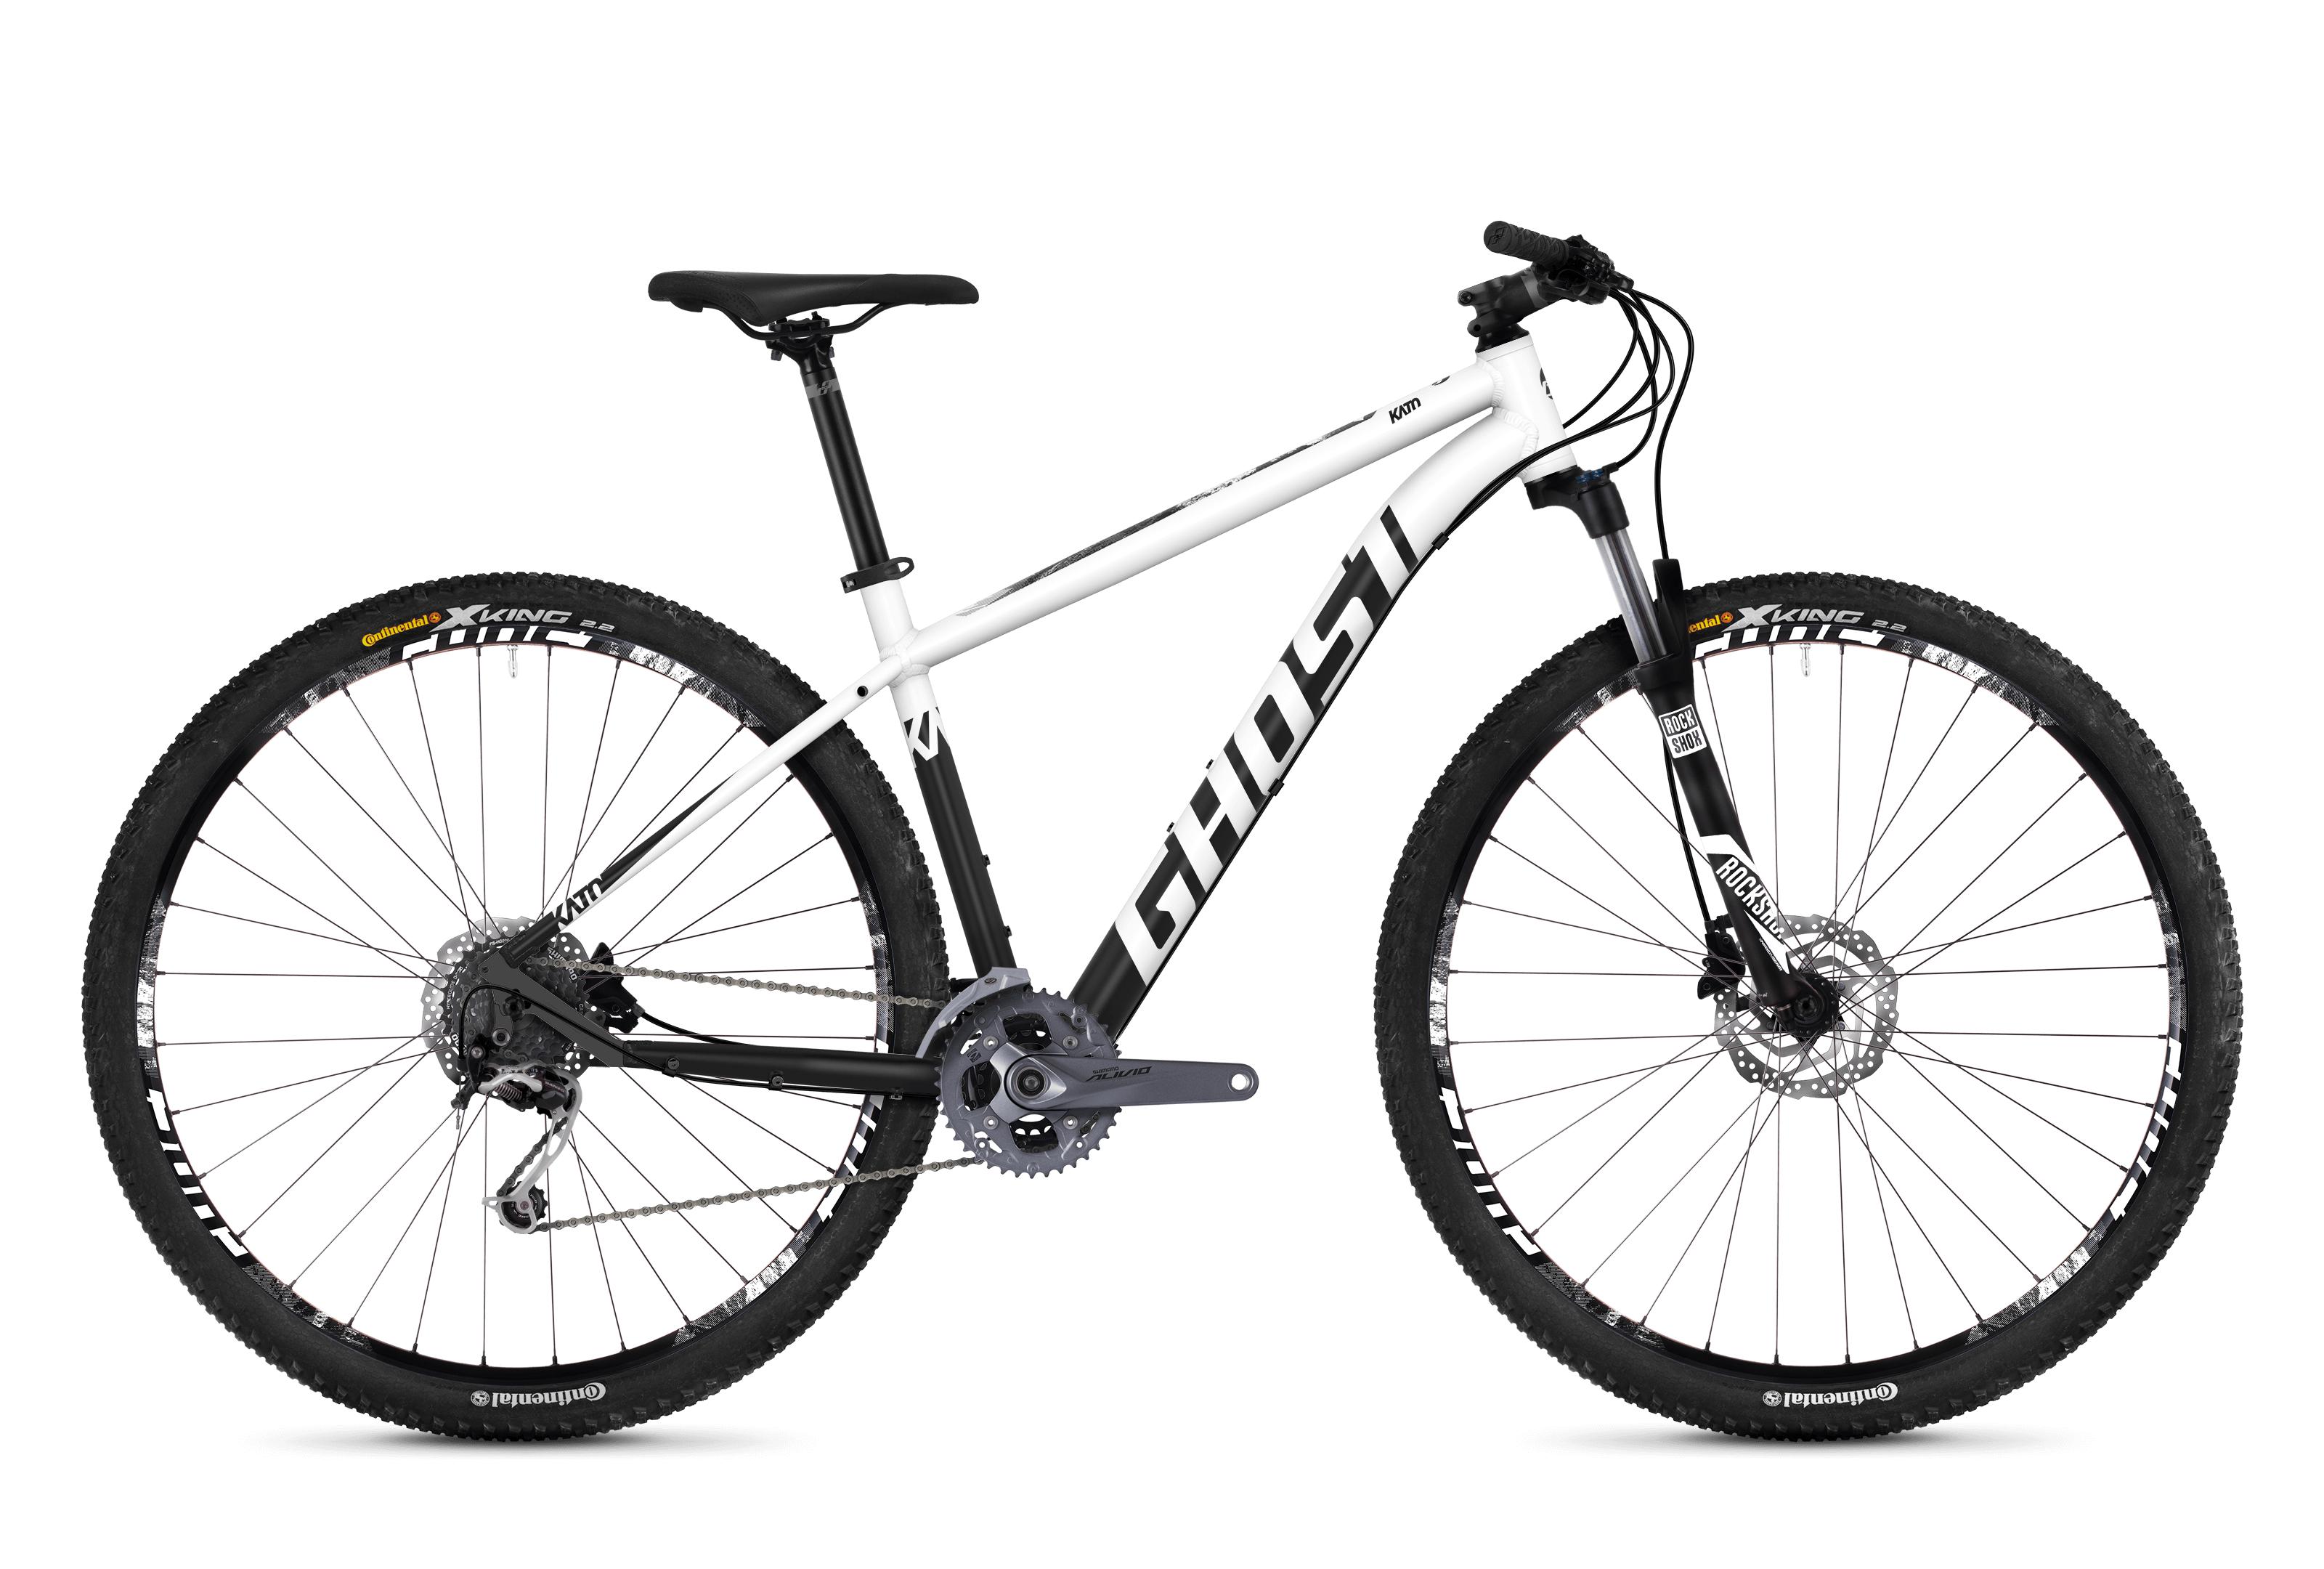 Horské kolo GHOST Kato 5.9 white / black XL 2018